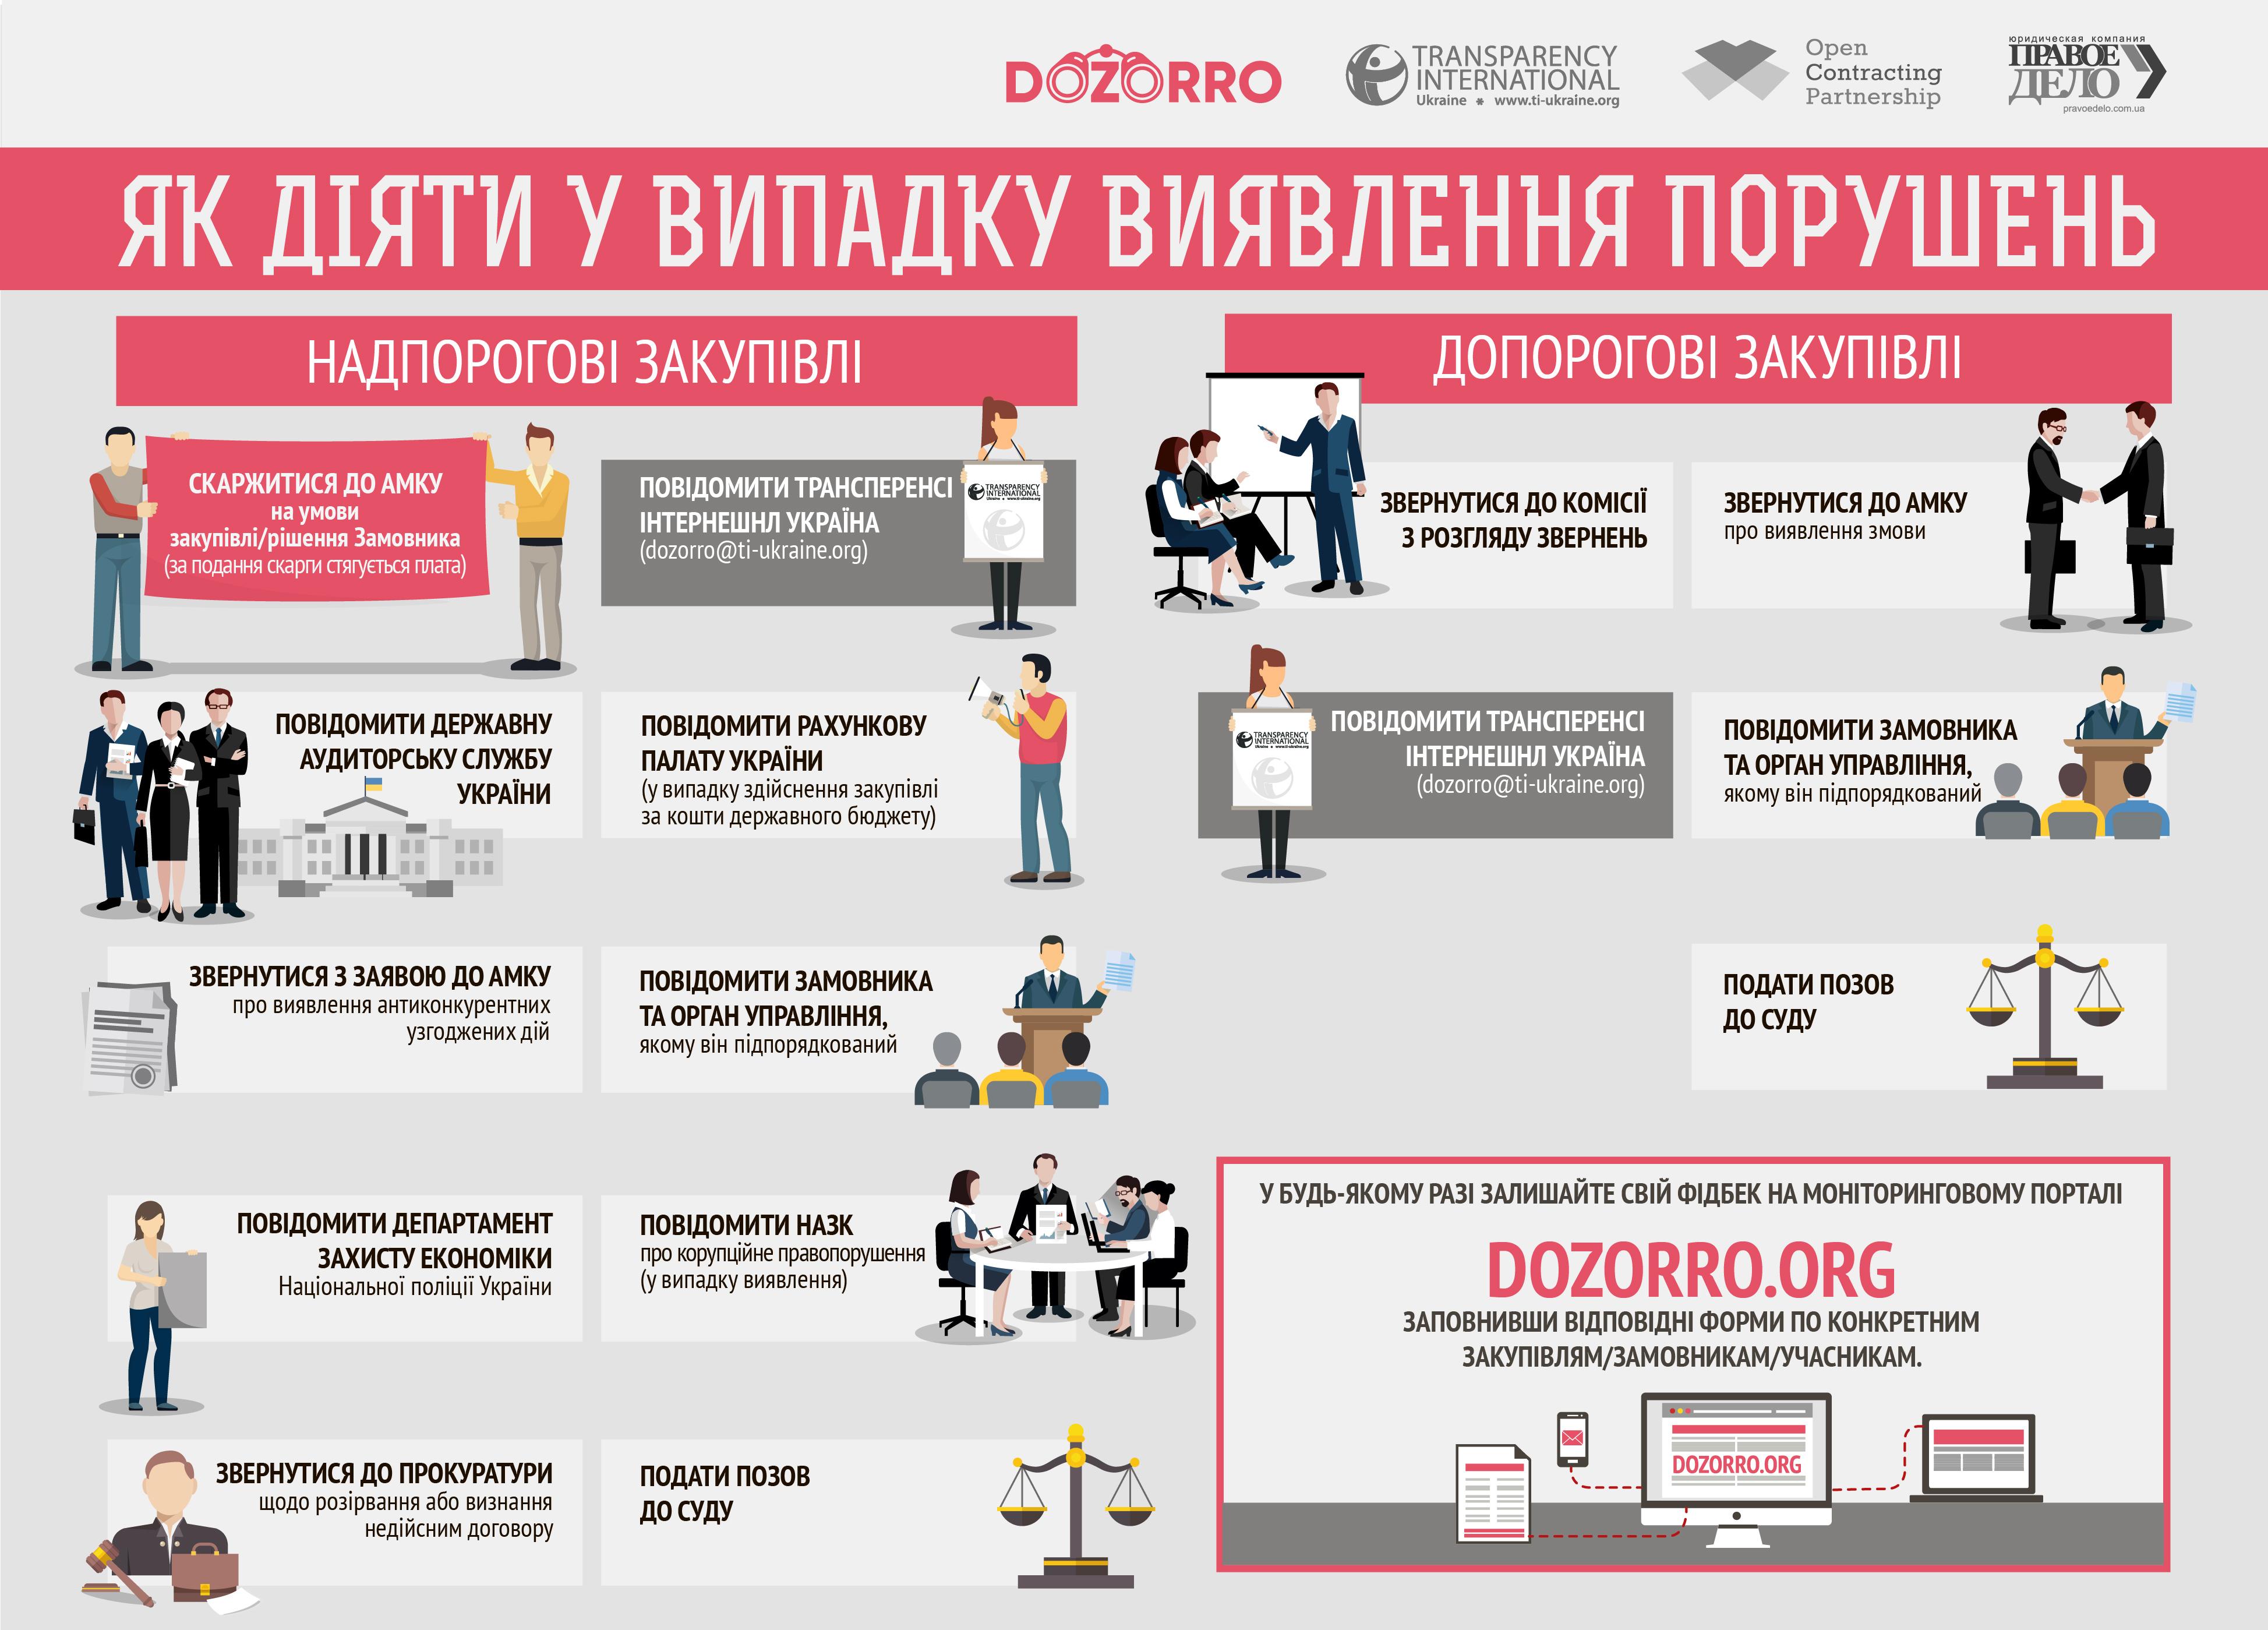 dozorro.org